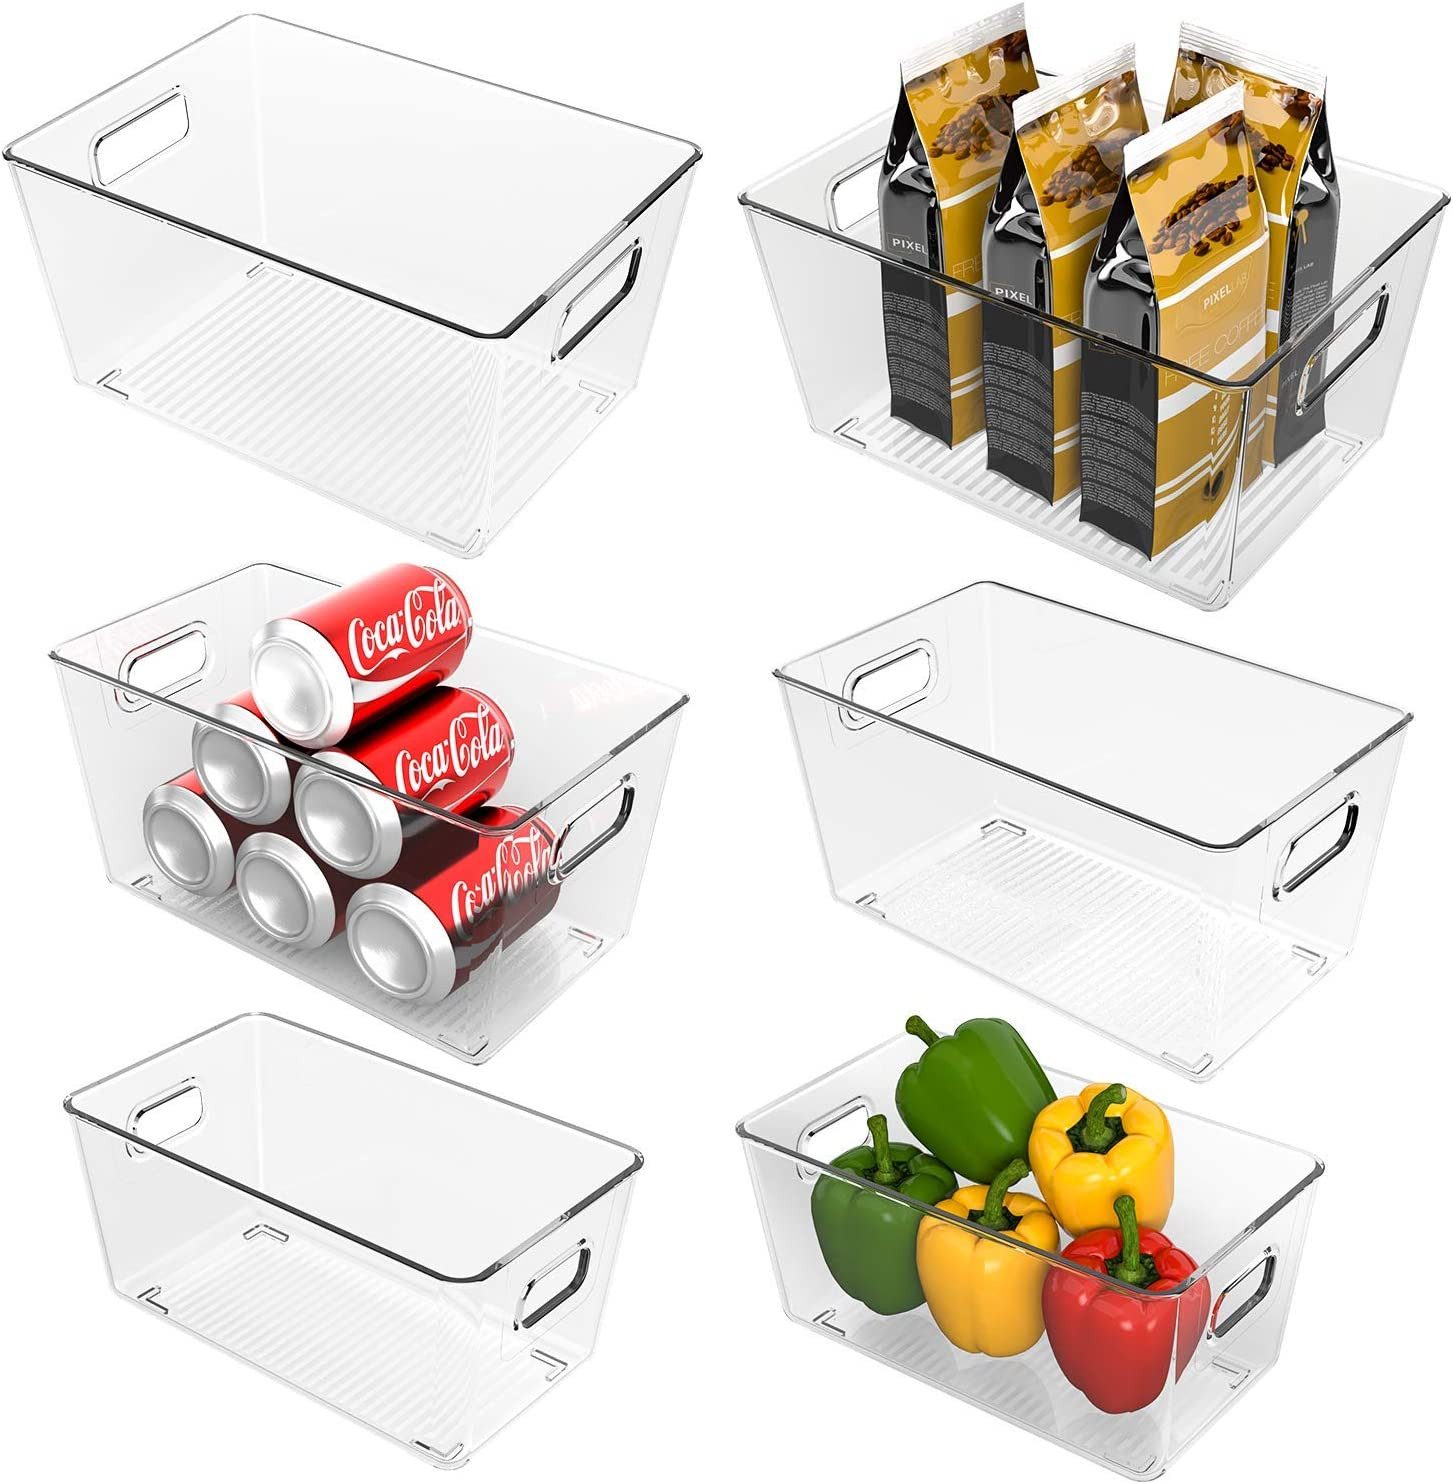 Ohuhu Fridge Organizers and Storage Clear, Refrigerator Organizer Bins, 6PCS Pantry Organizer, Plastic Storage Bins, Food-Grade PET Material Shatter-Resistant for Kitchen, Countertops, Cabinets